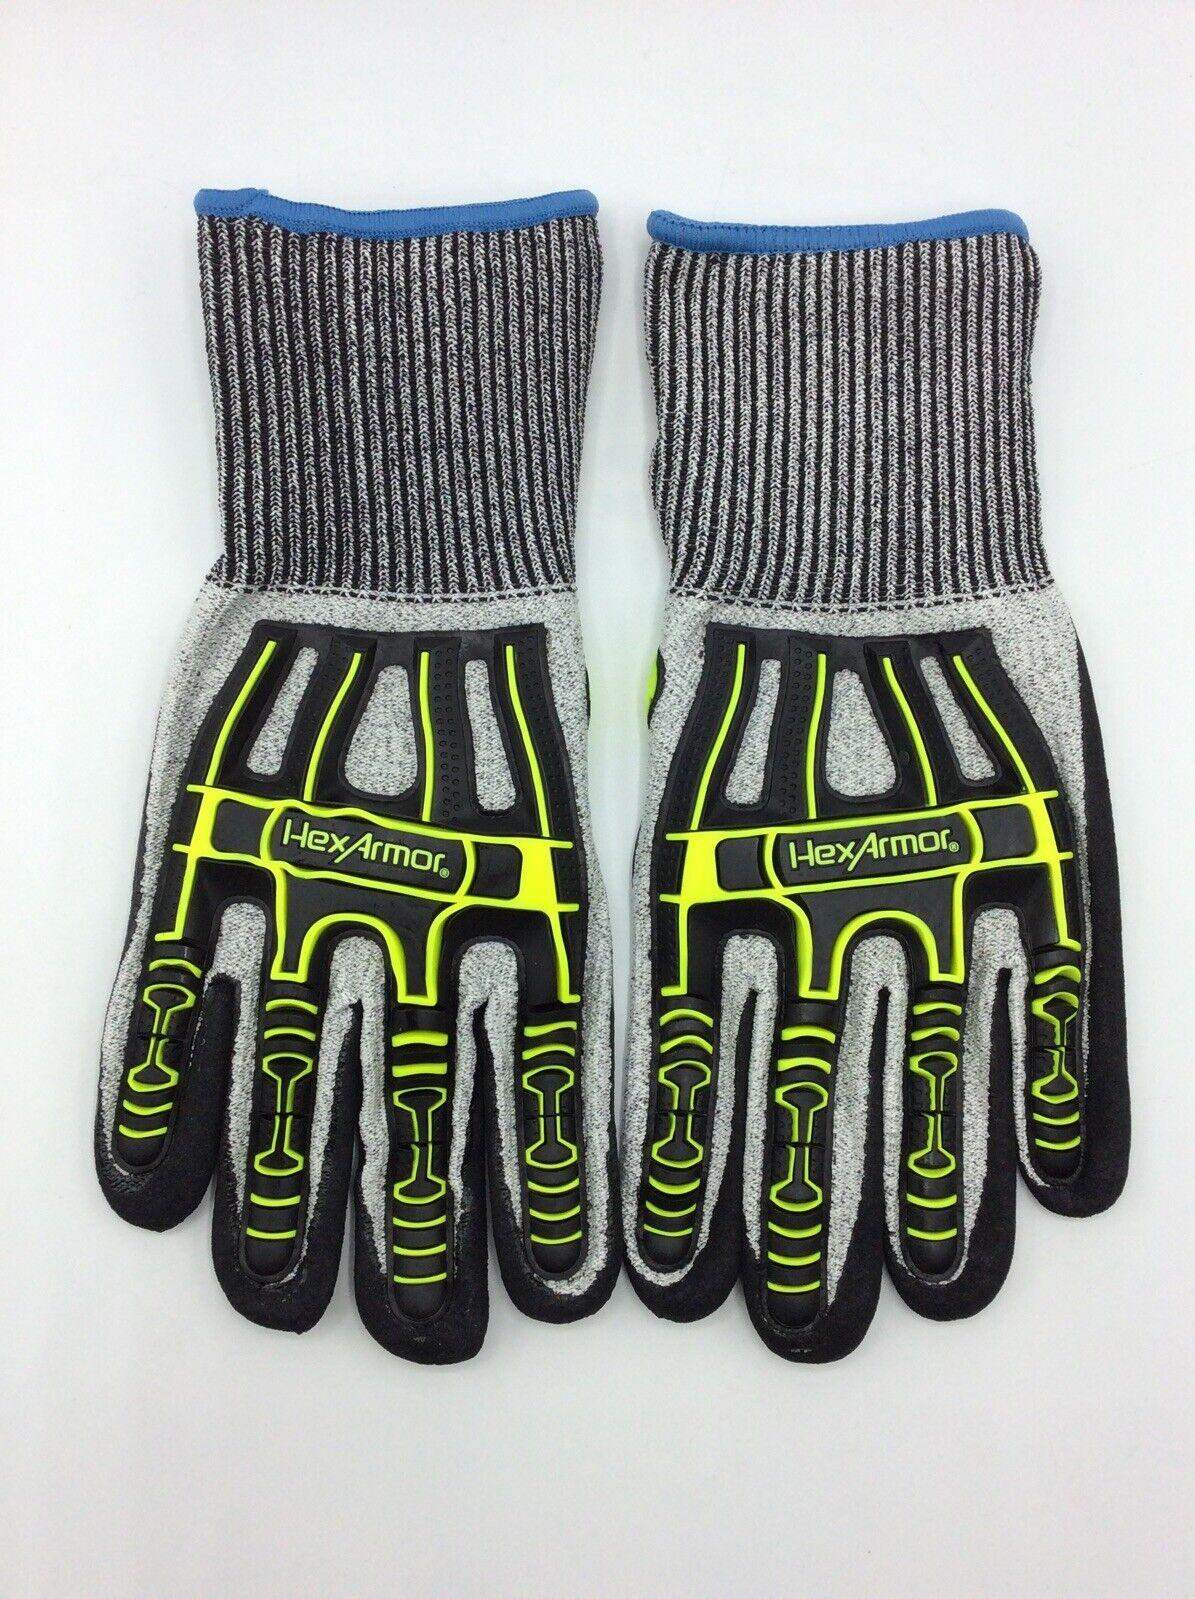 HexArmor Rig Lizard Thin Lizzie 2090 High Dexterity Gloves M